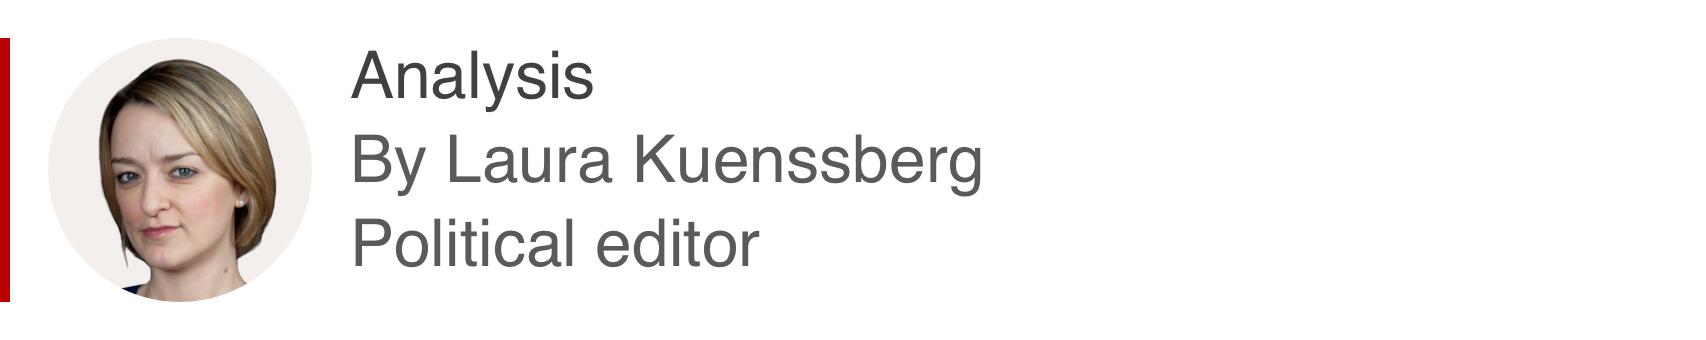 Analysis by Laura Kuenssberg, political editor